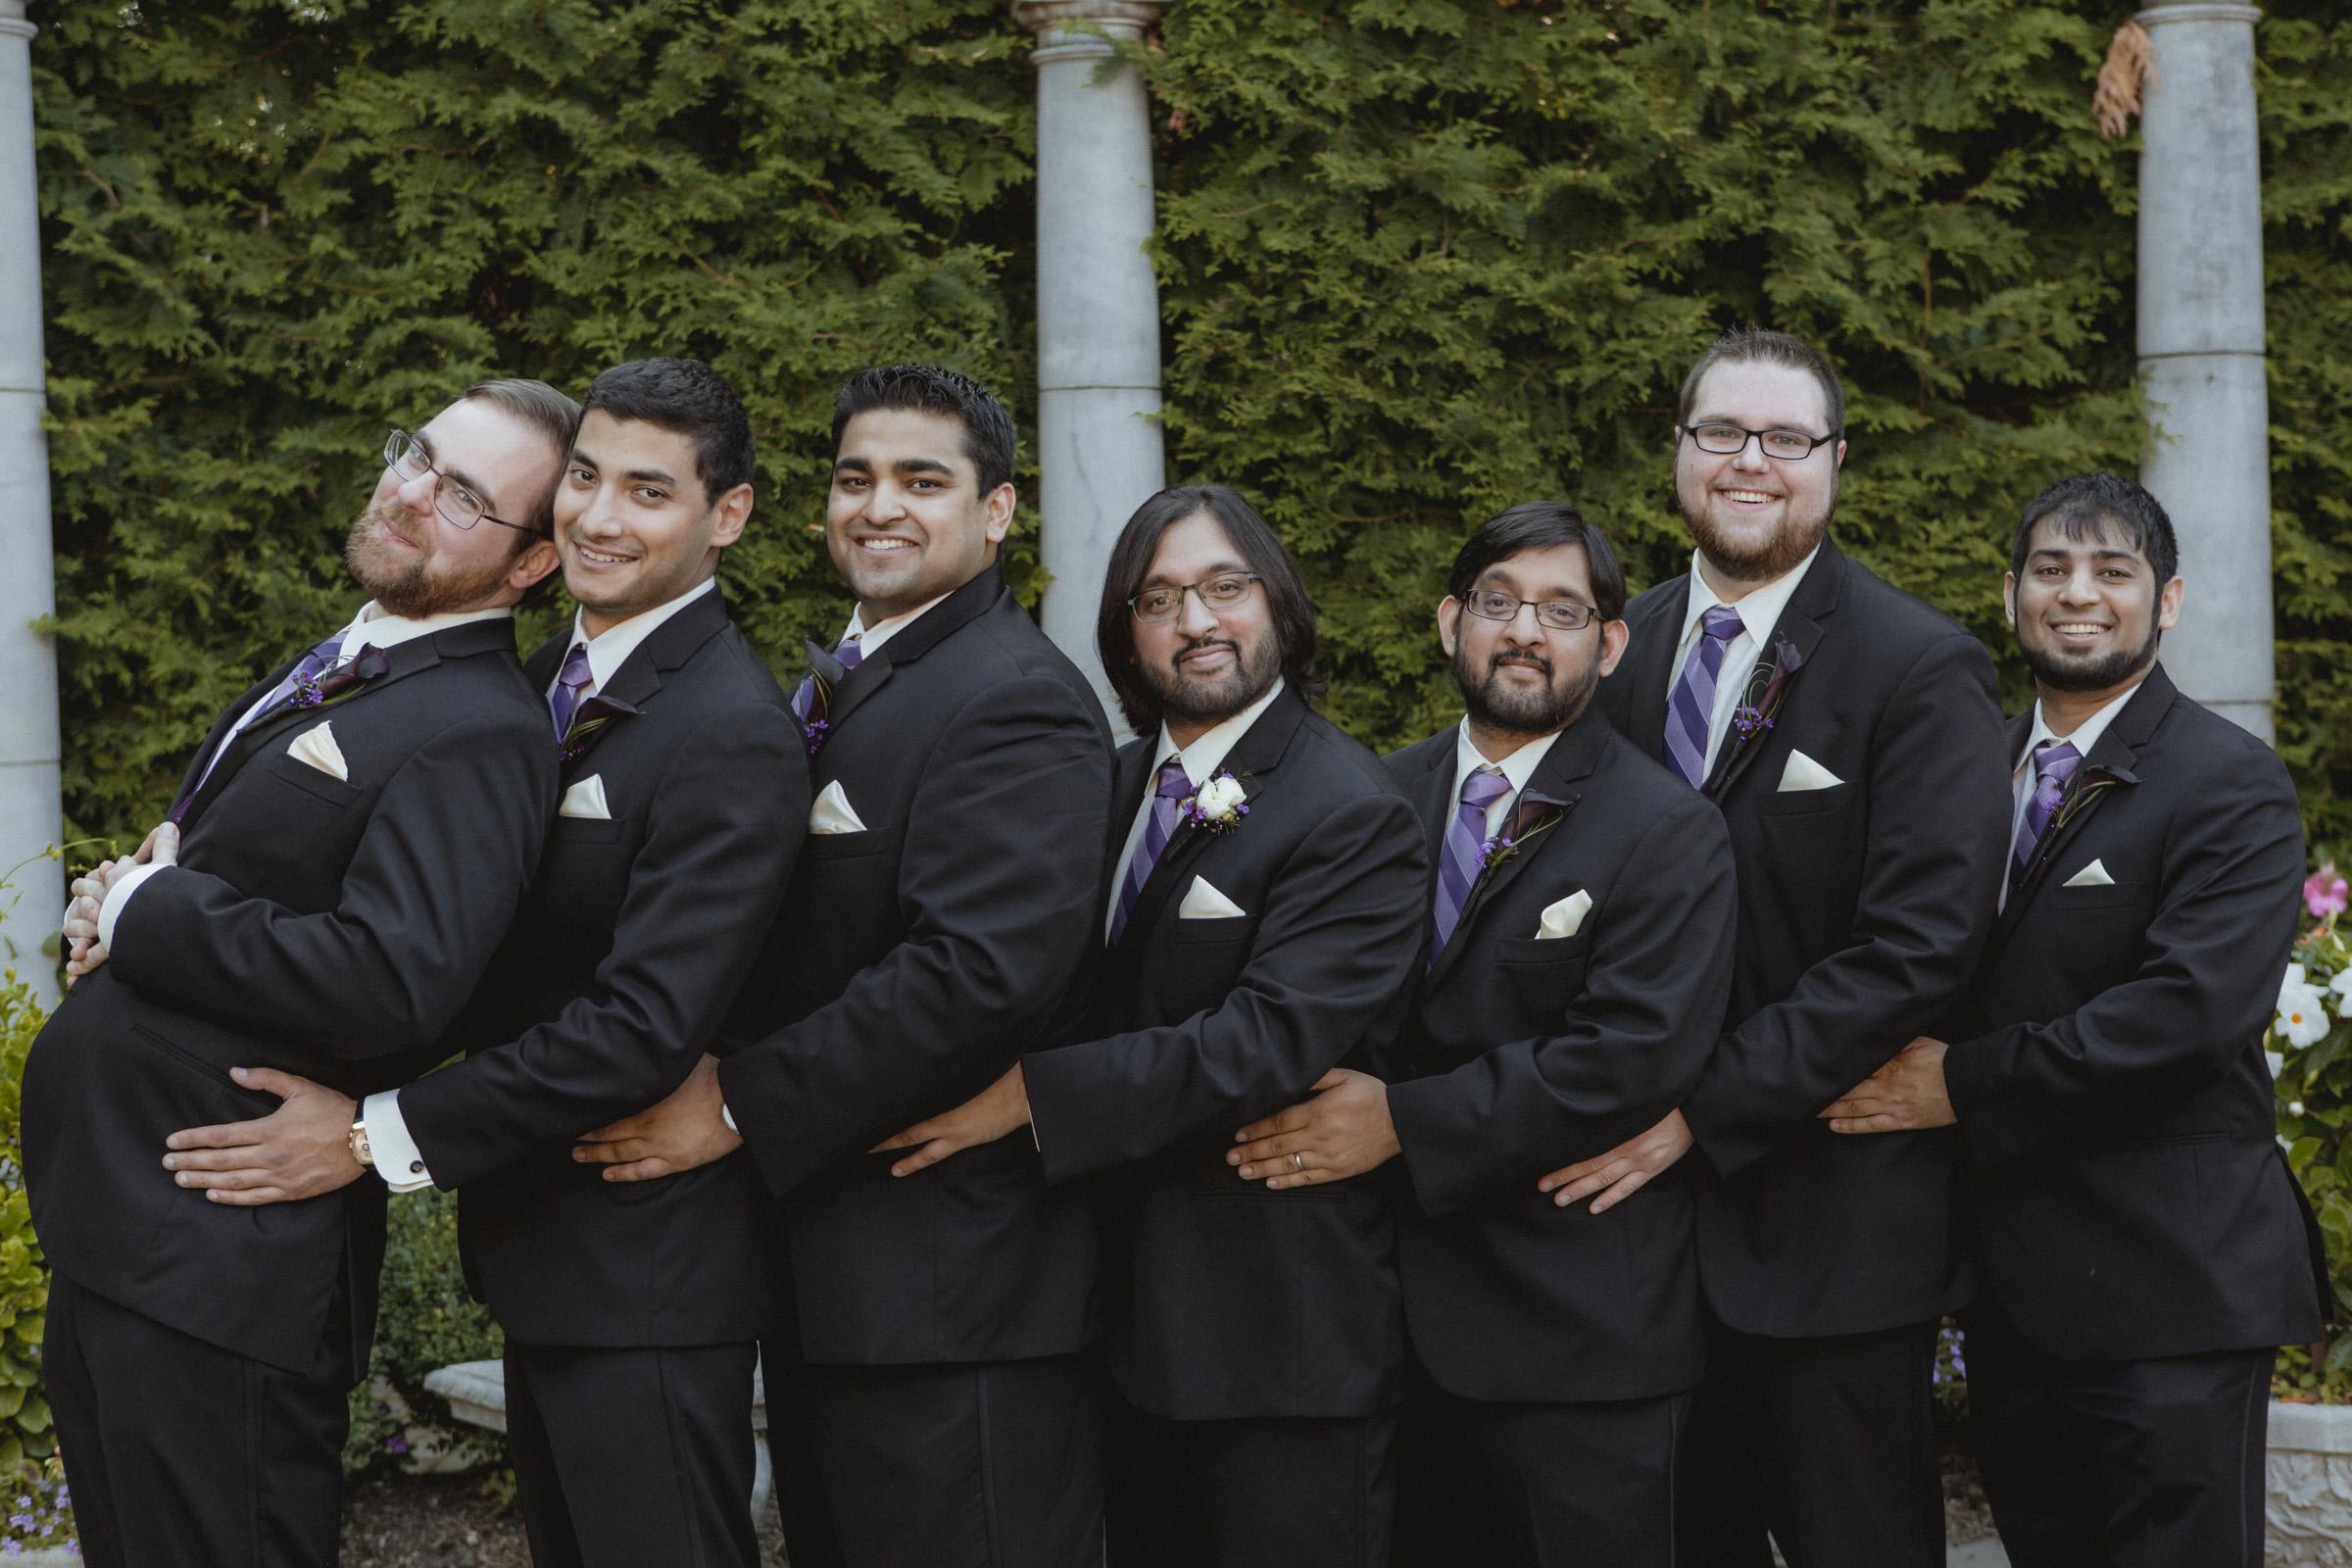 Groom and groomsmen do longest awkward prom photo pose - Estate at Florentine Gardens wedding - Hudson Valley Wedding - Kelsey & Anish's wedding - Amy Sims Photography